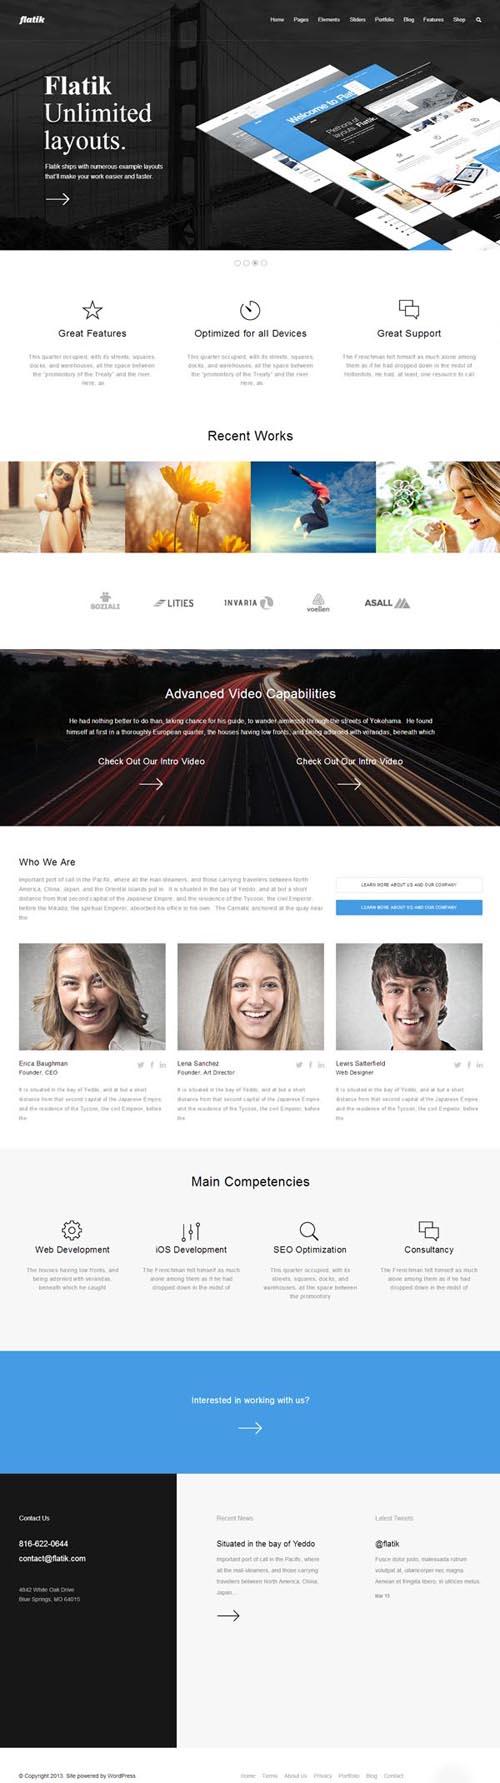 Адаптивные шаблоны WordPress с html5 версткой